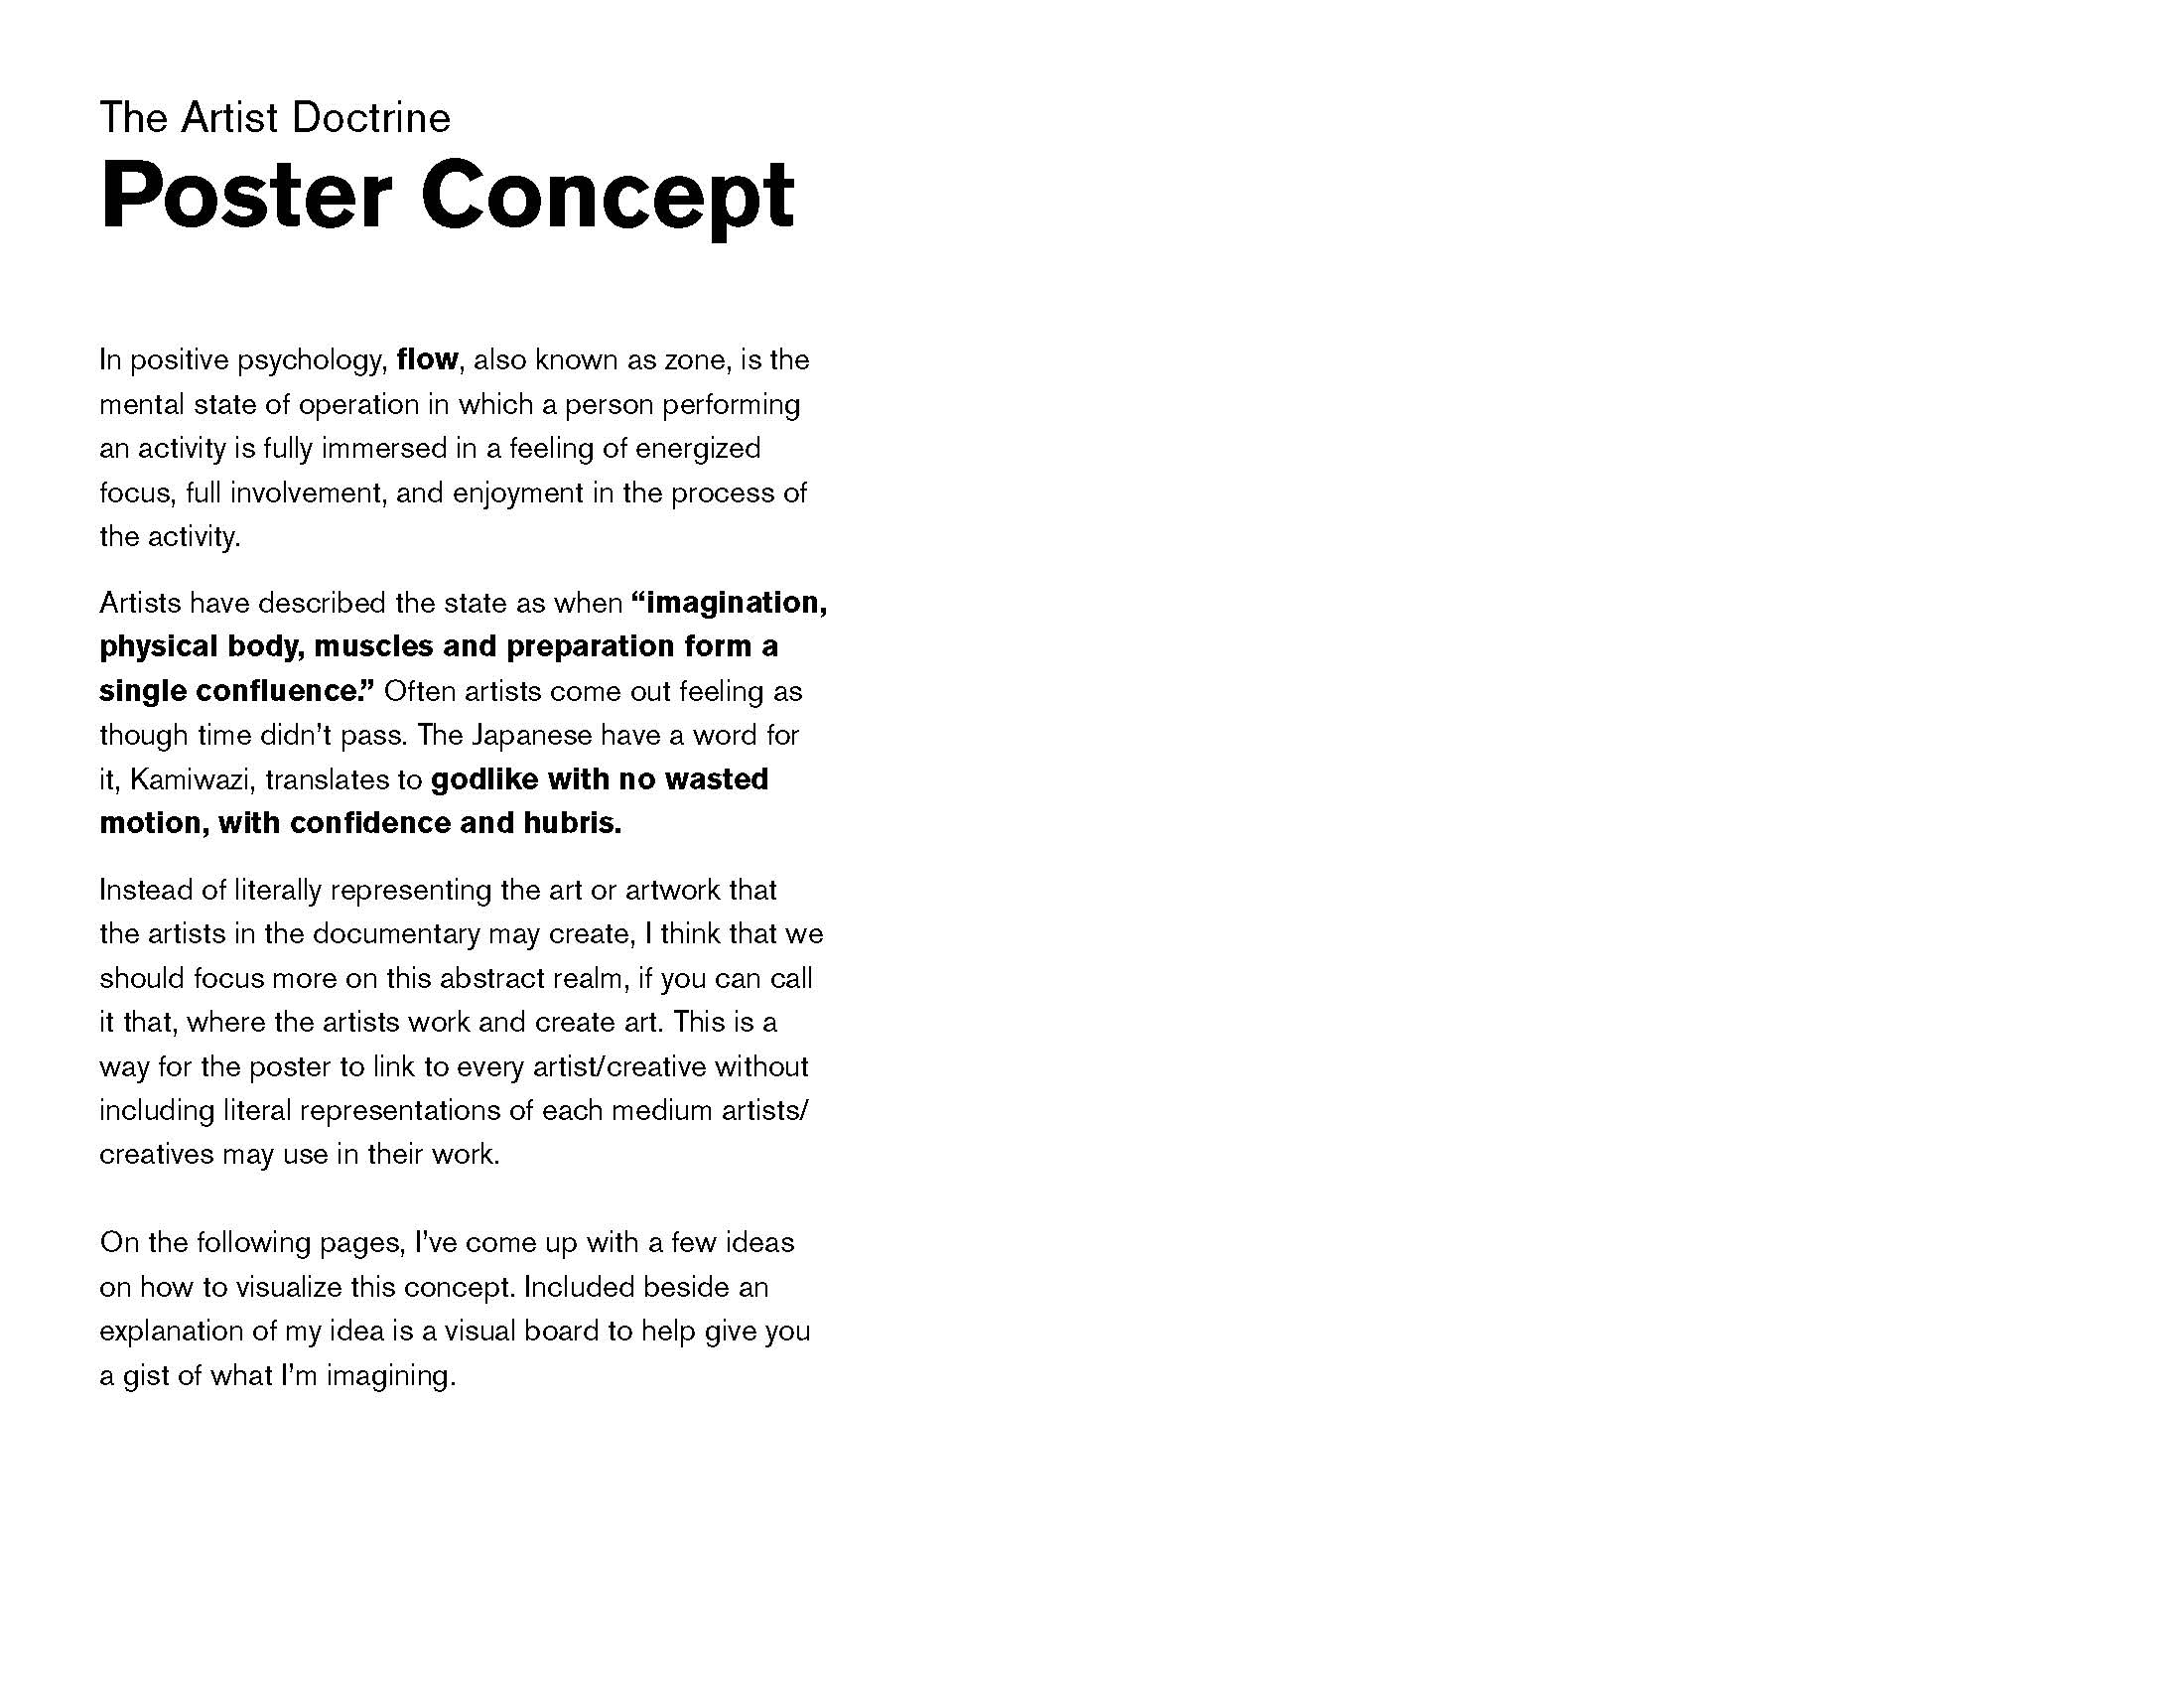 Poster-Concept-Artist-Doctrine_Page_2.jpg